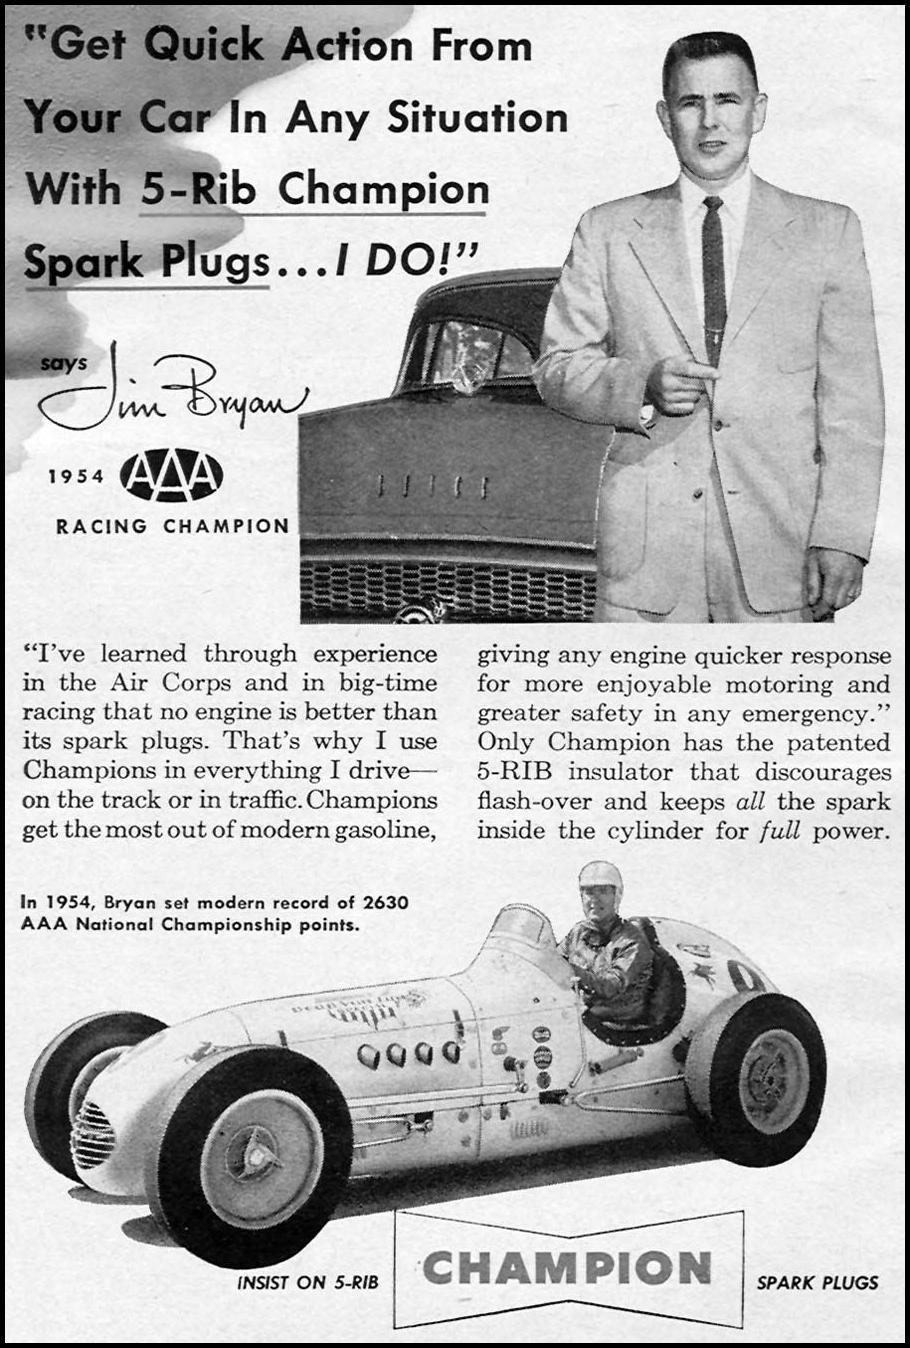 CHAMPION SPARK PLUGS CORONET 08/01/1955 p. 4